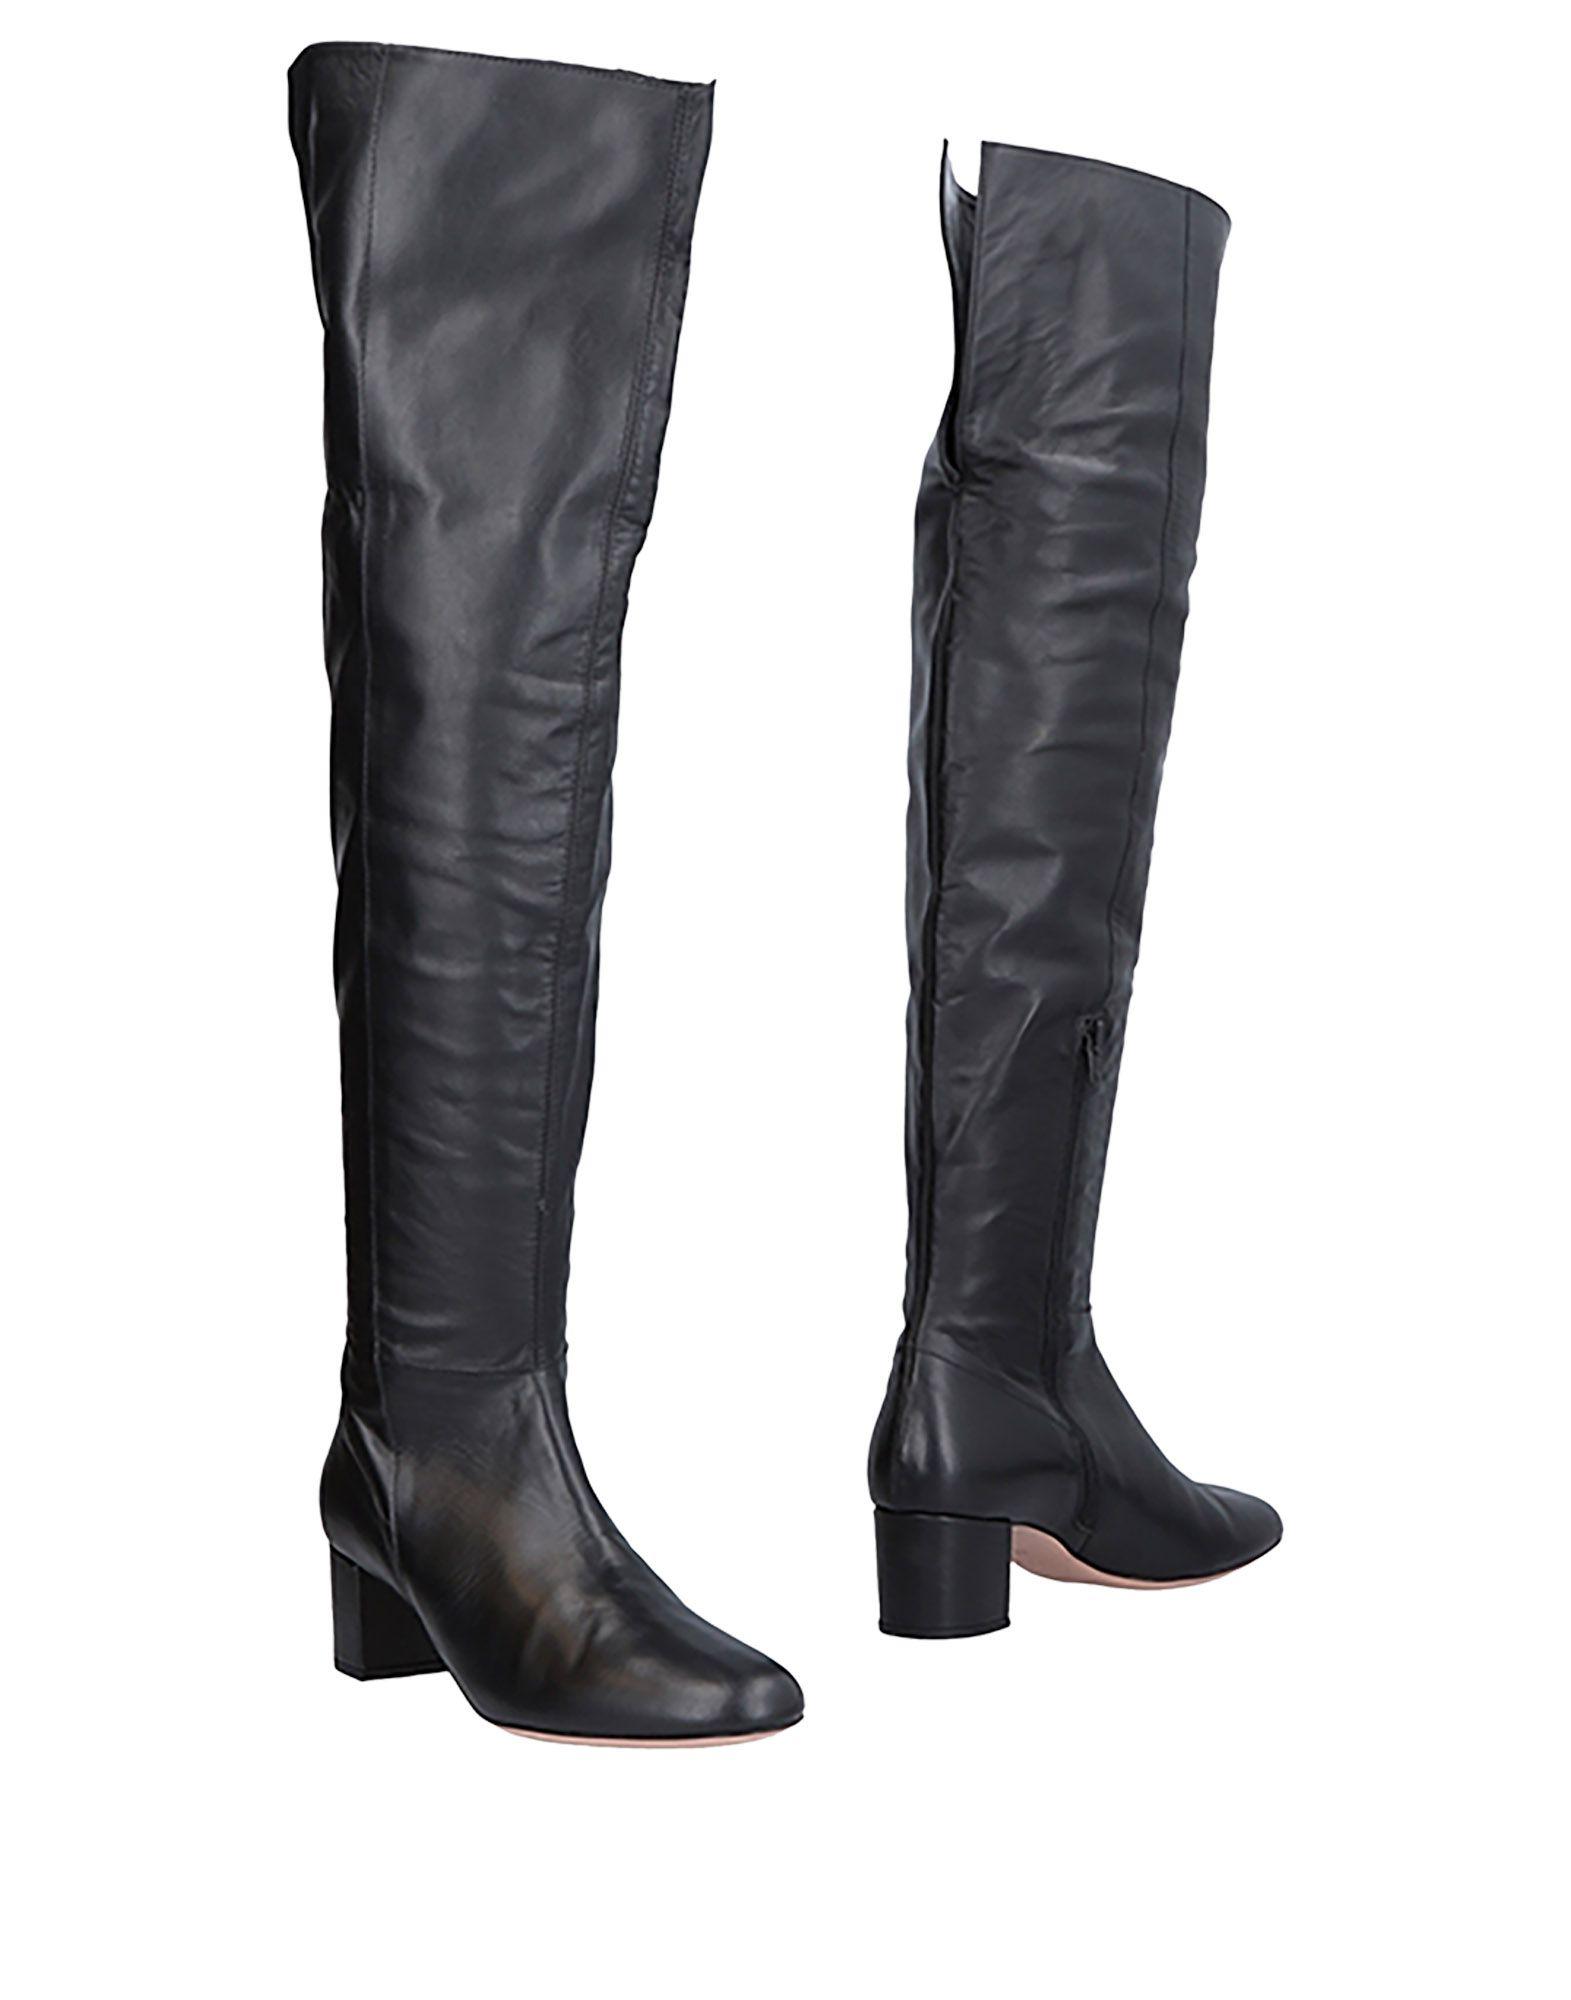 IRIS & INK Boots in Black